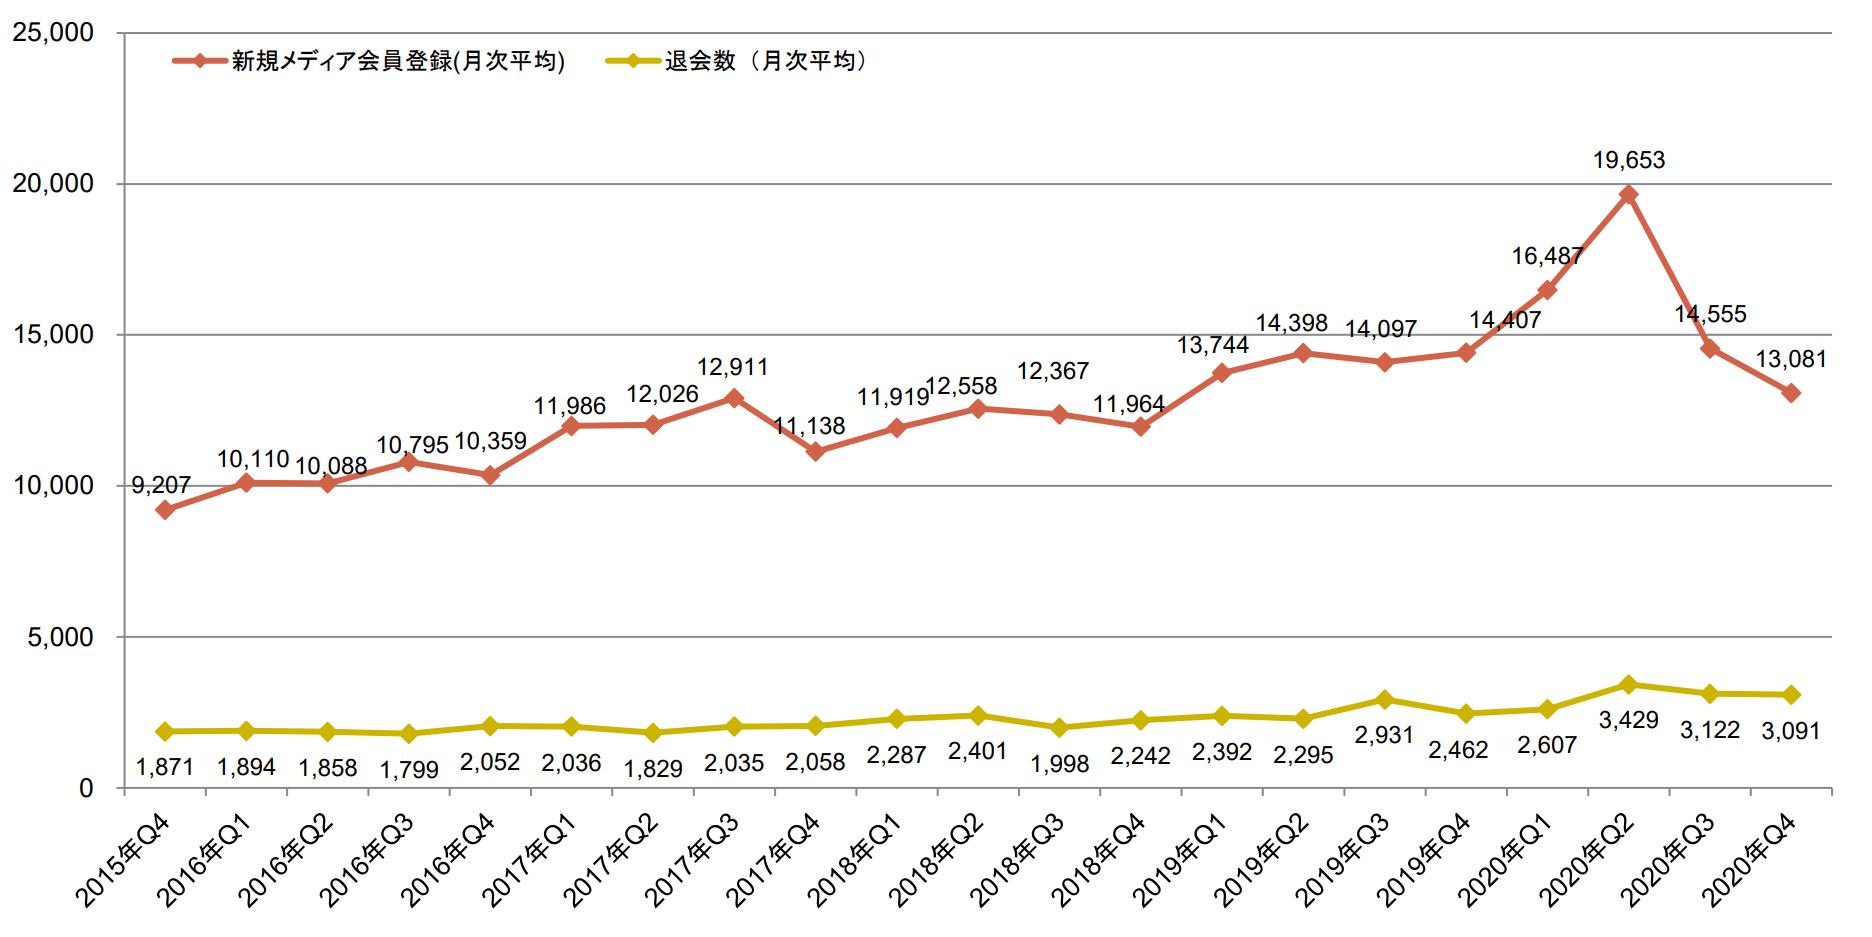 「A8.net」の登録者に関する推移のグラフ